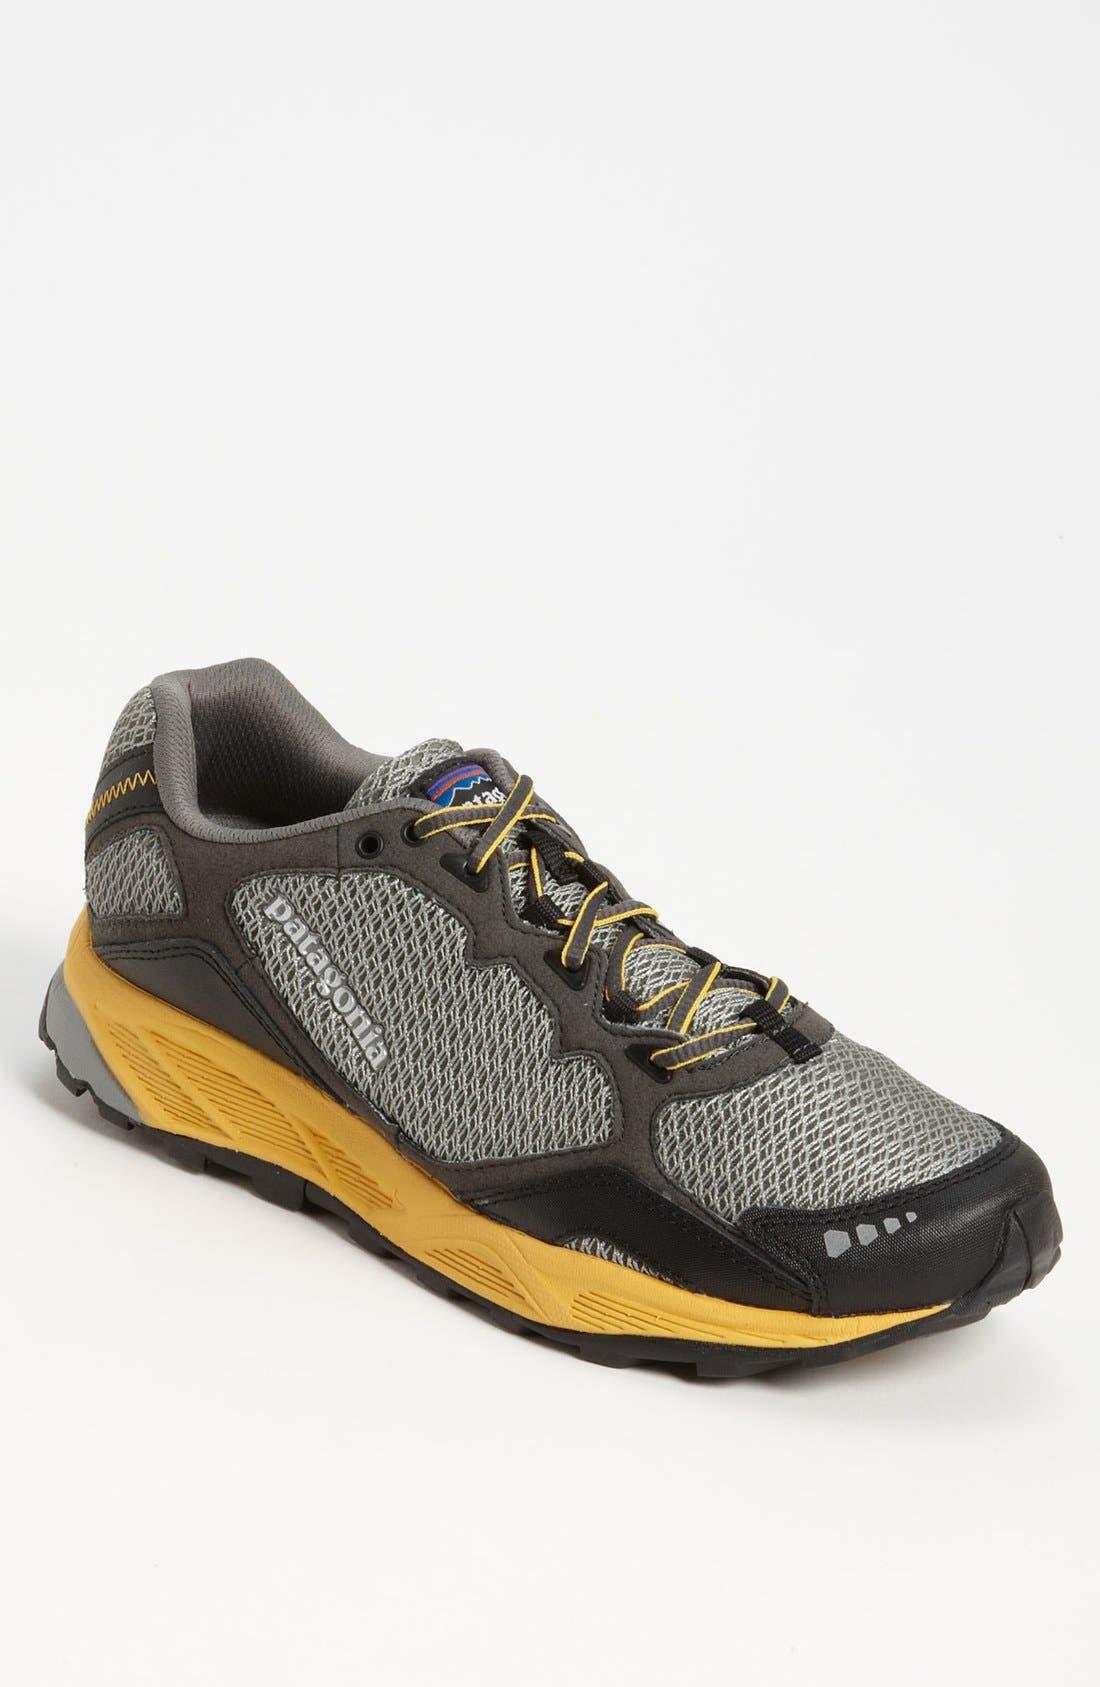 Alternate Image 1 Selected - Patagonia 'Gamut' Trail Running Shoe (Men)